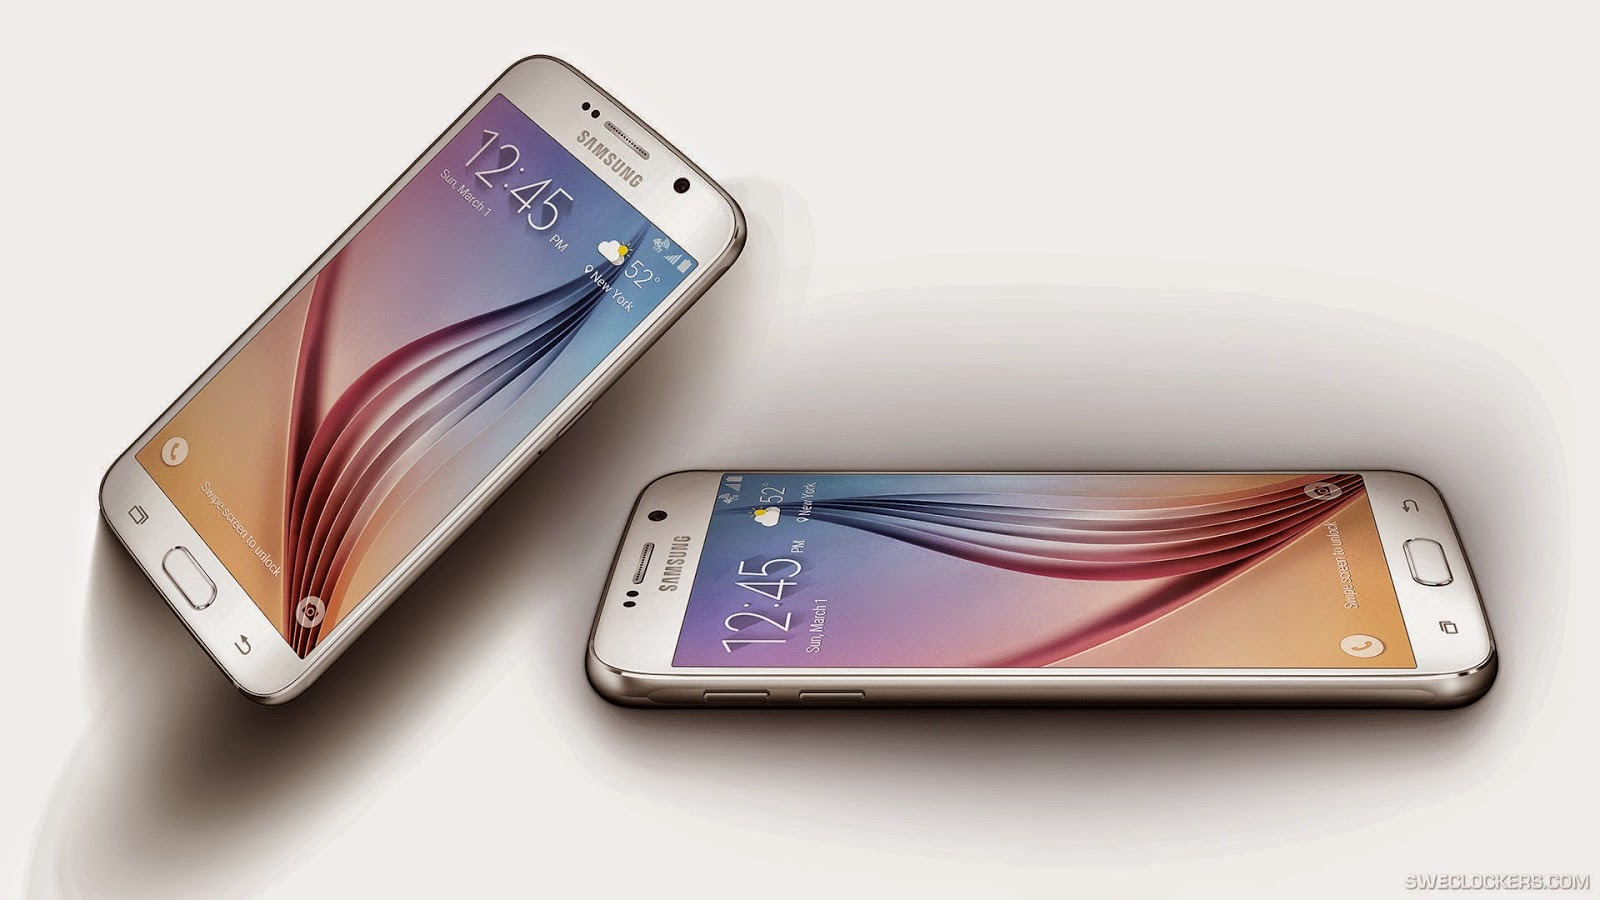 Samsung Galaxy S6 Edge Hd Wallpaper 56: Samsung Galaxy S6 Y S6 Edge